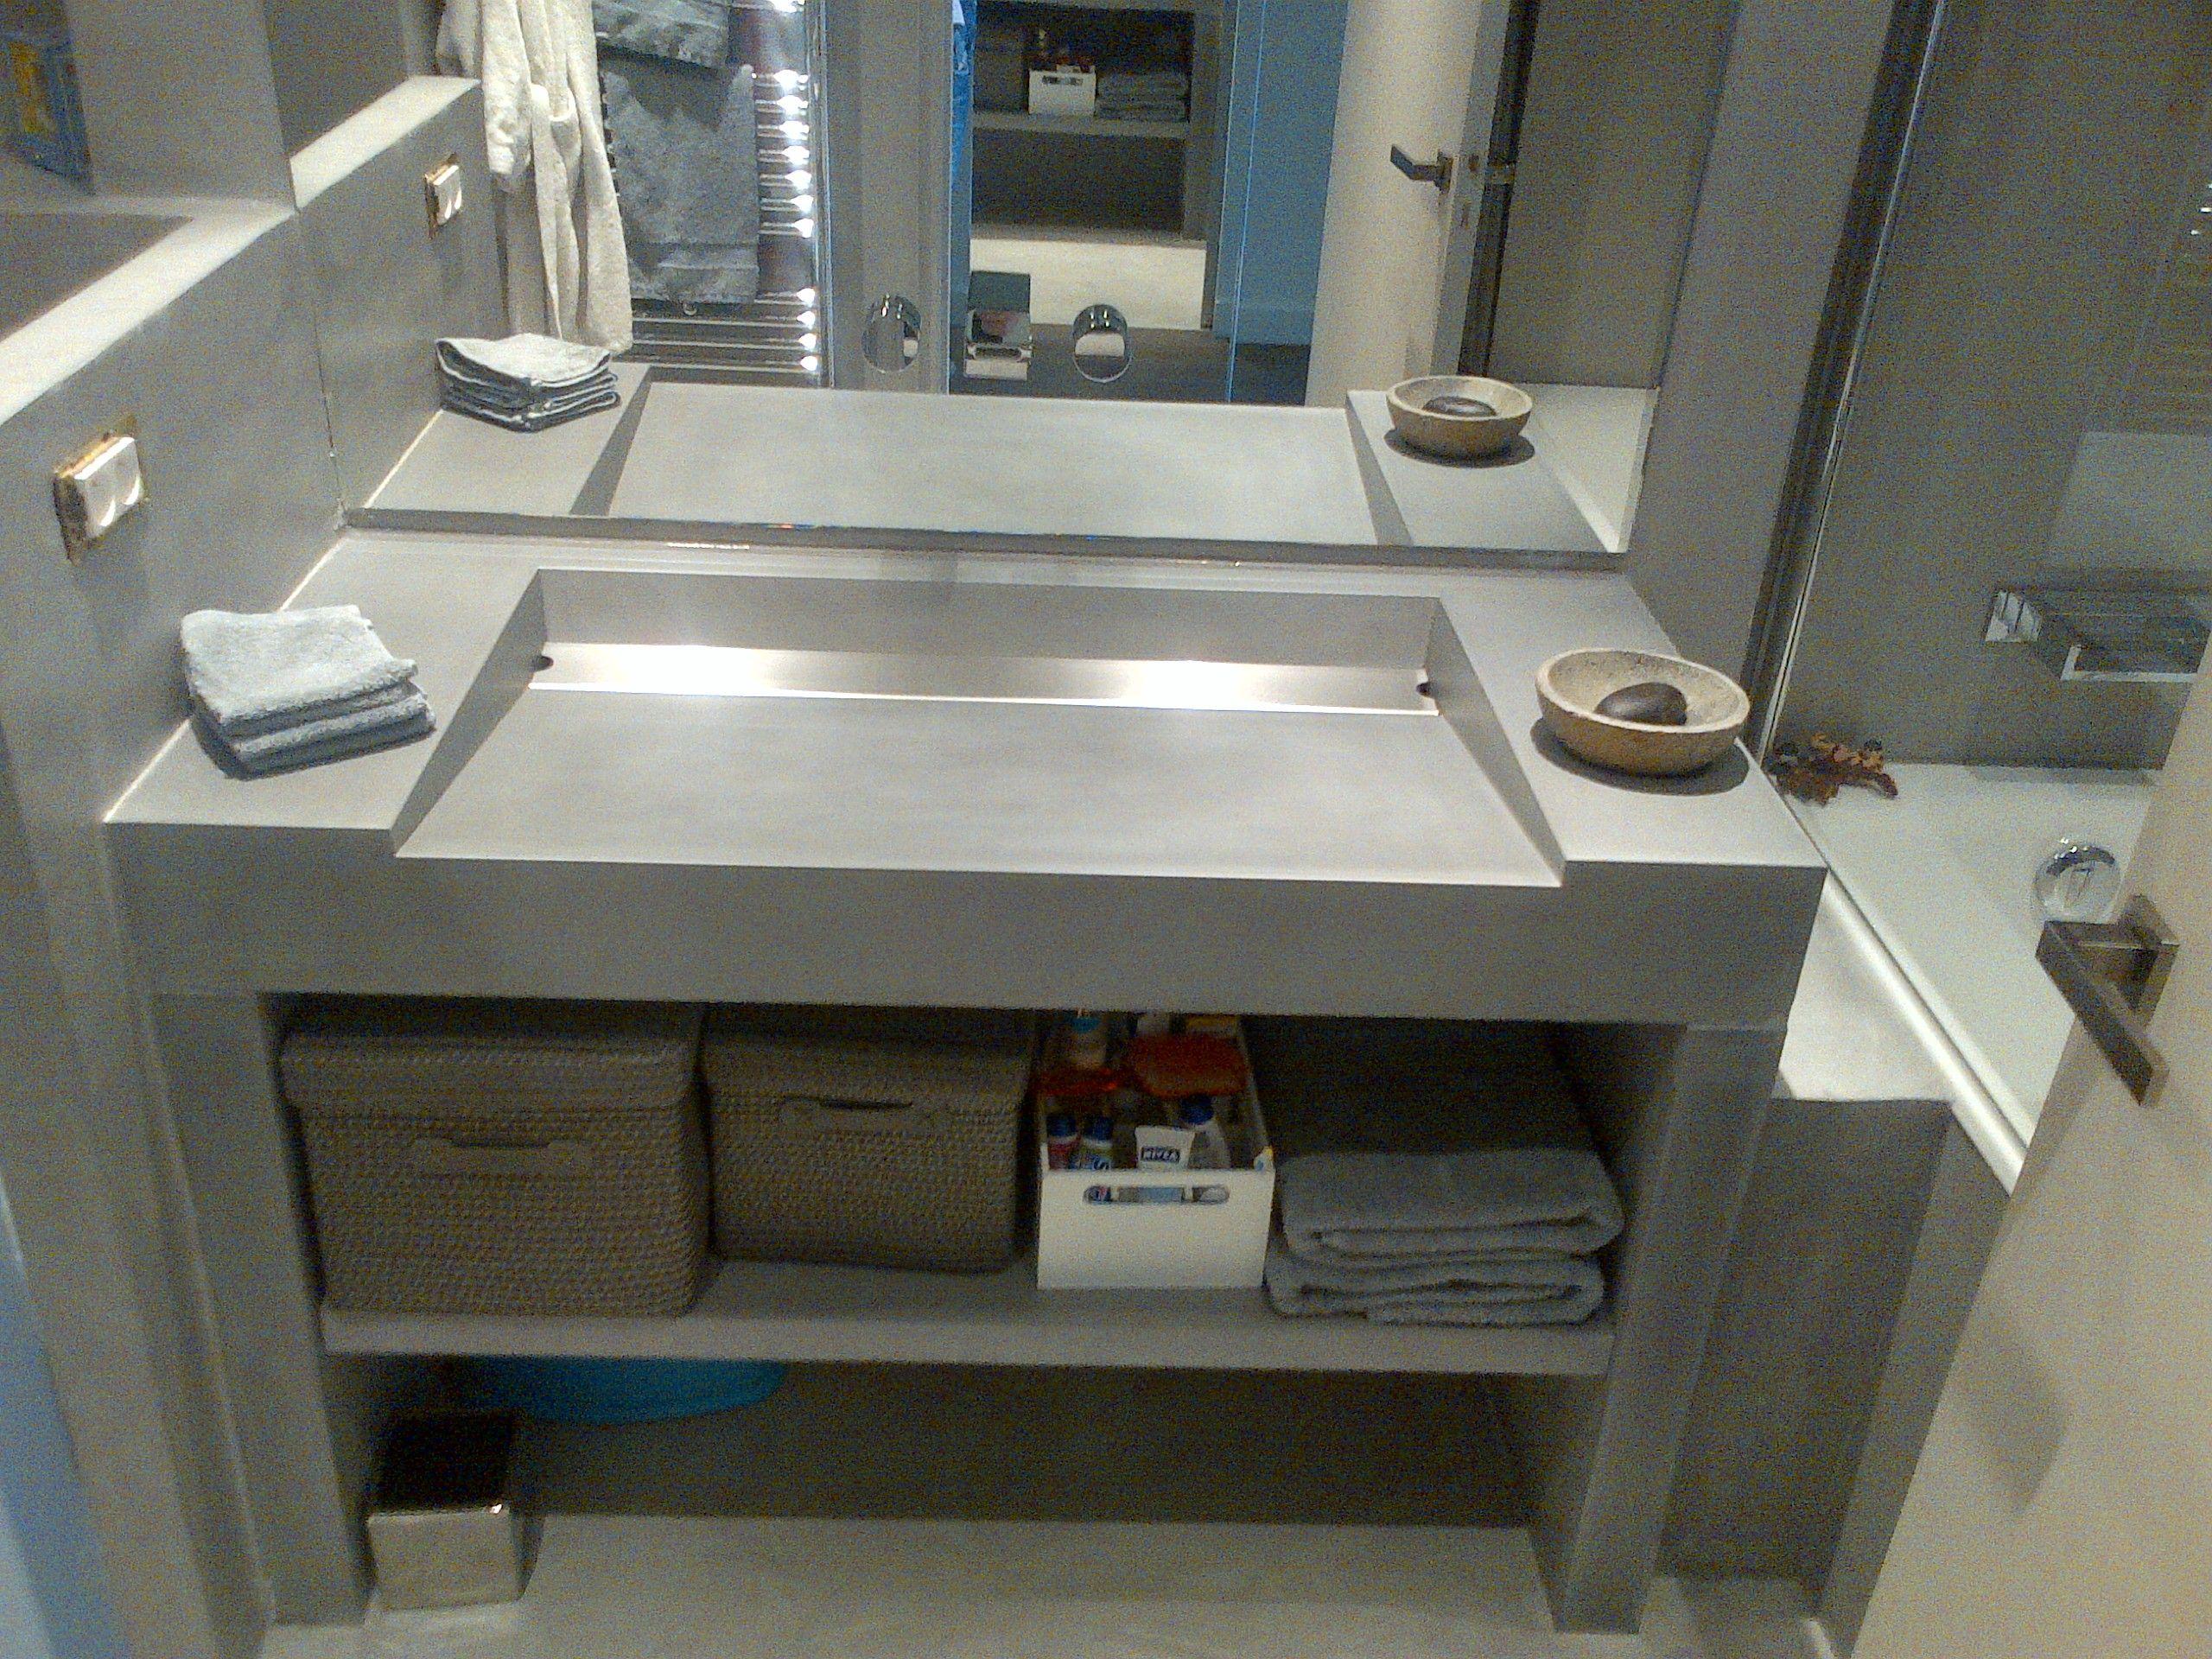 lcda concrete vasque beton et inox salle de bain pinterest salle de bain vasque et evier. Black Bedroom Furniture Sets. Home Design Ideas